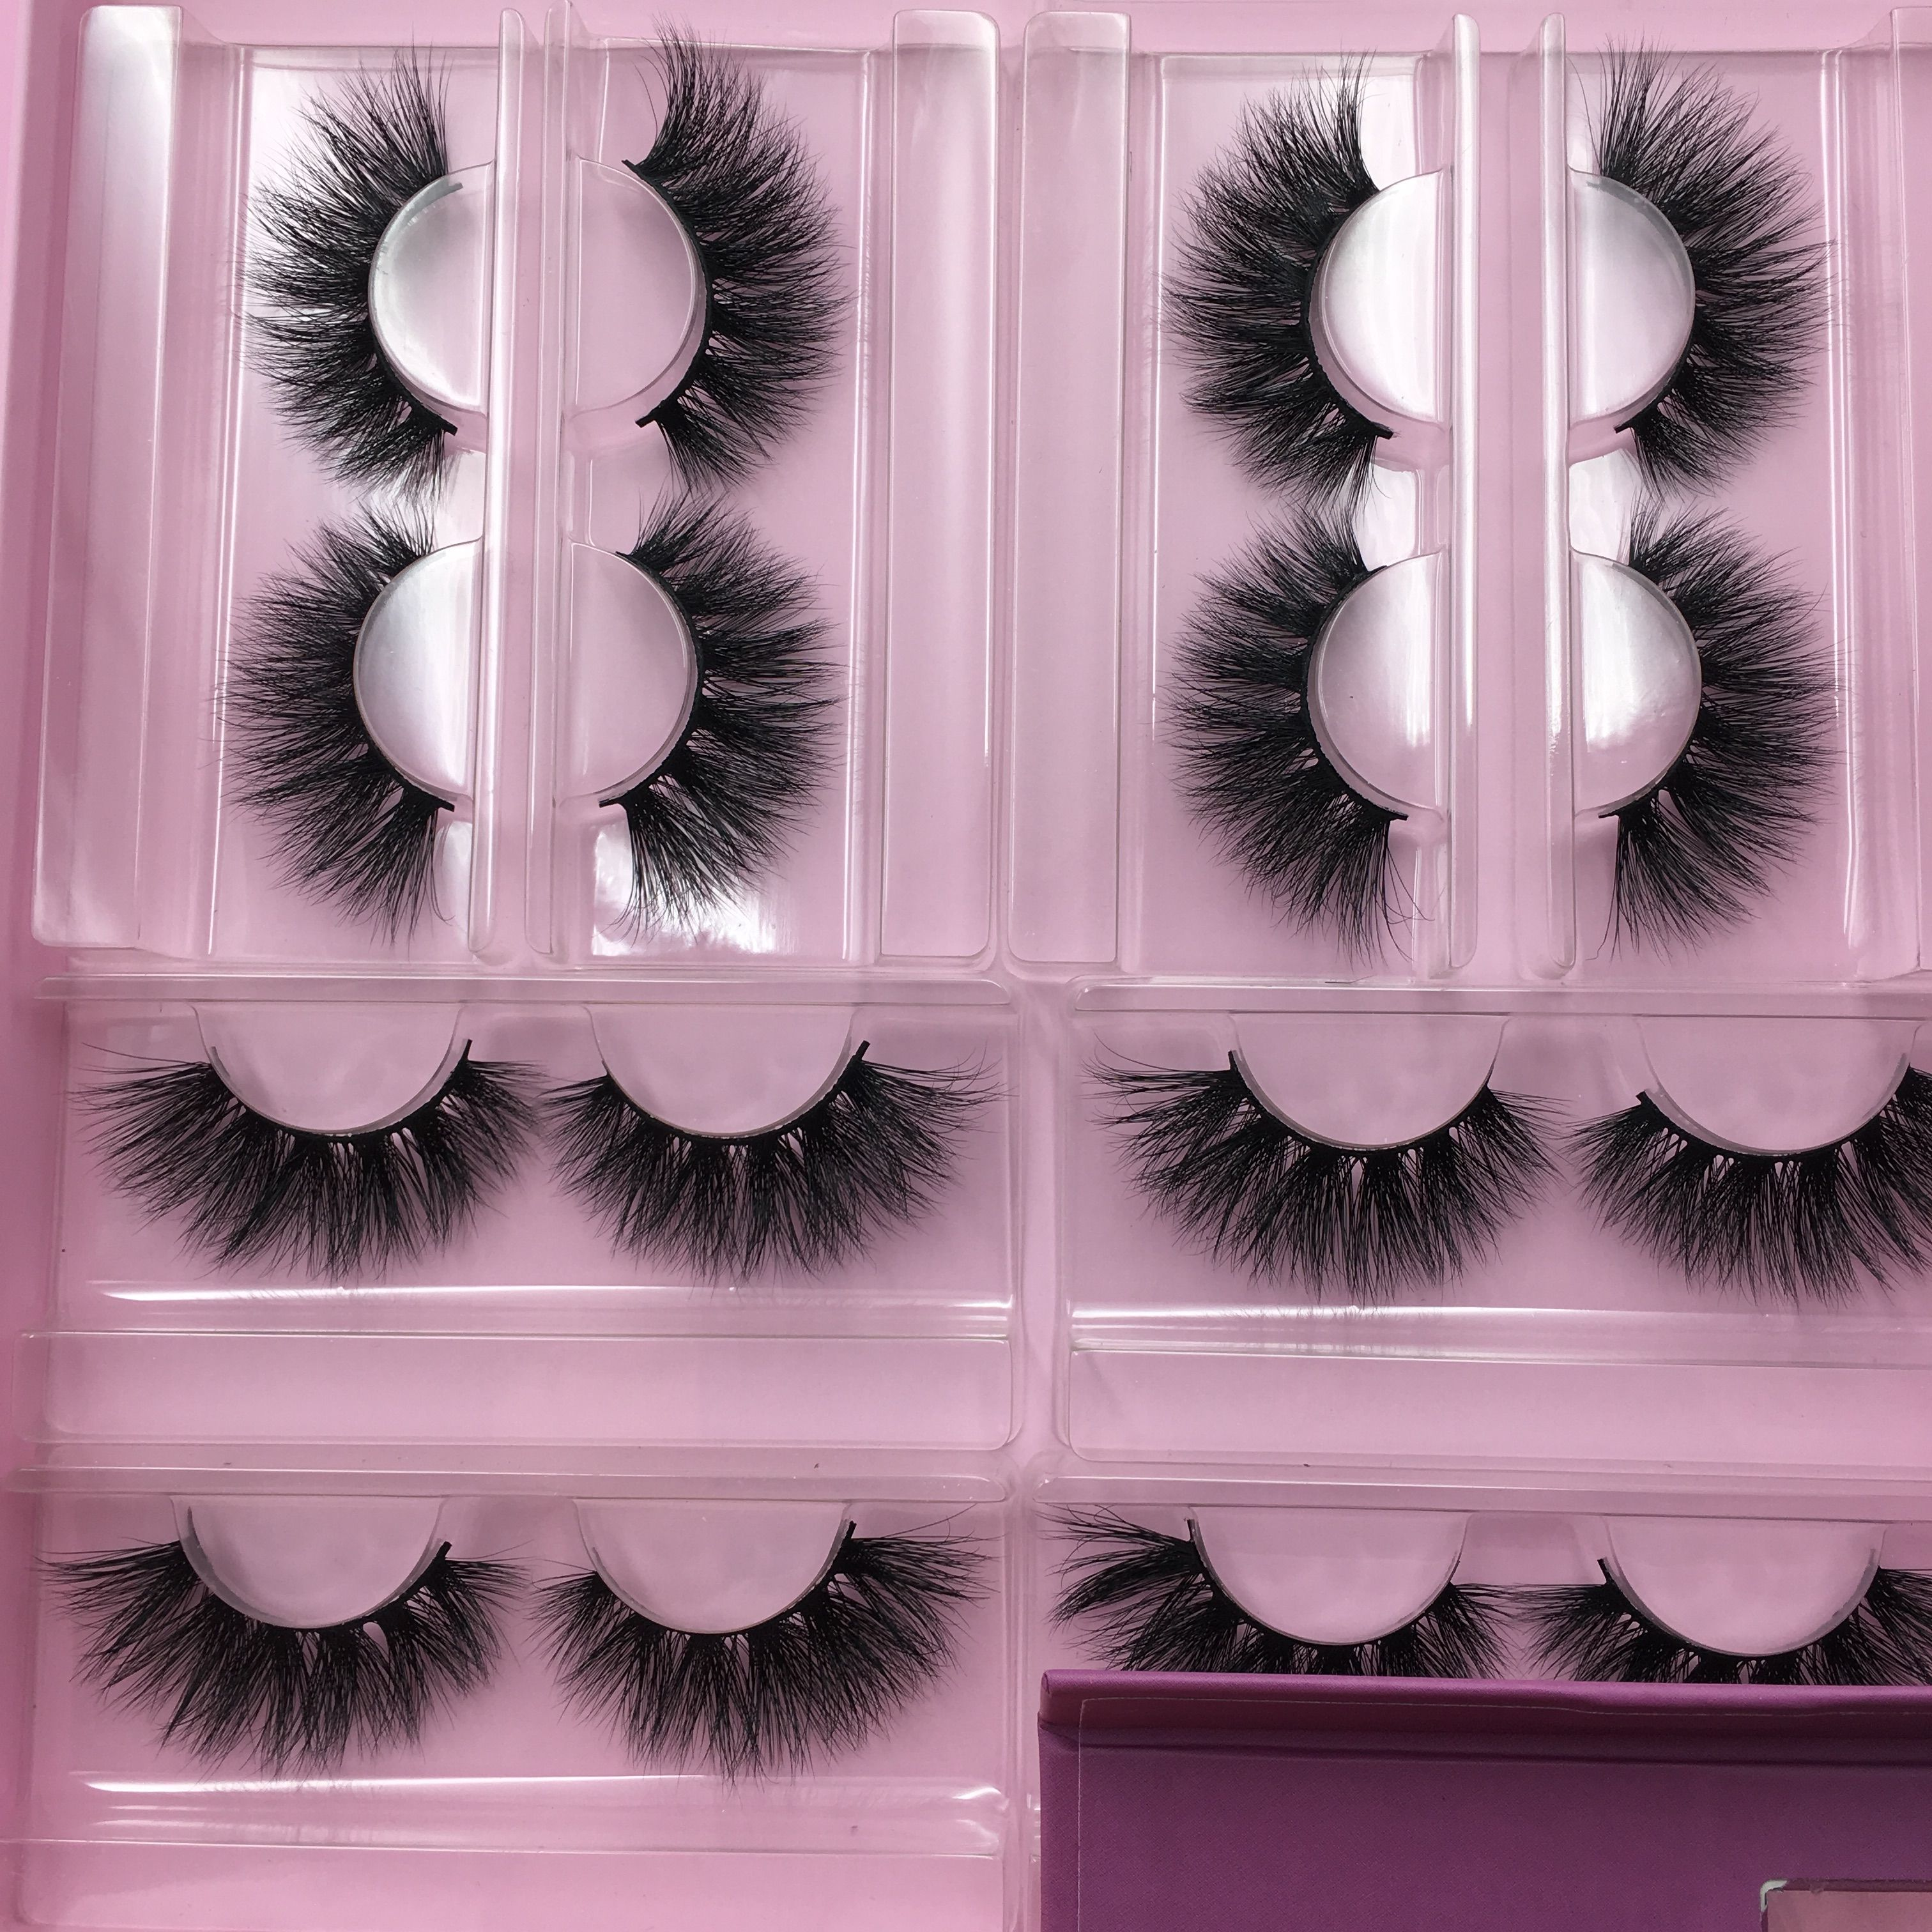 b1d0b5502b9 #wholesale eyelash vendors #3d mink lash vendors #eyelashes vendor #mink  lashes bulk